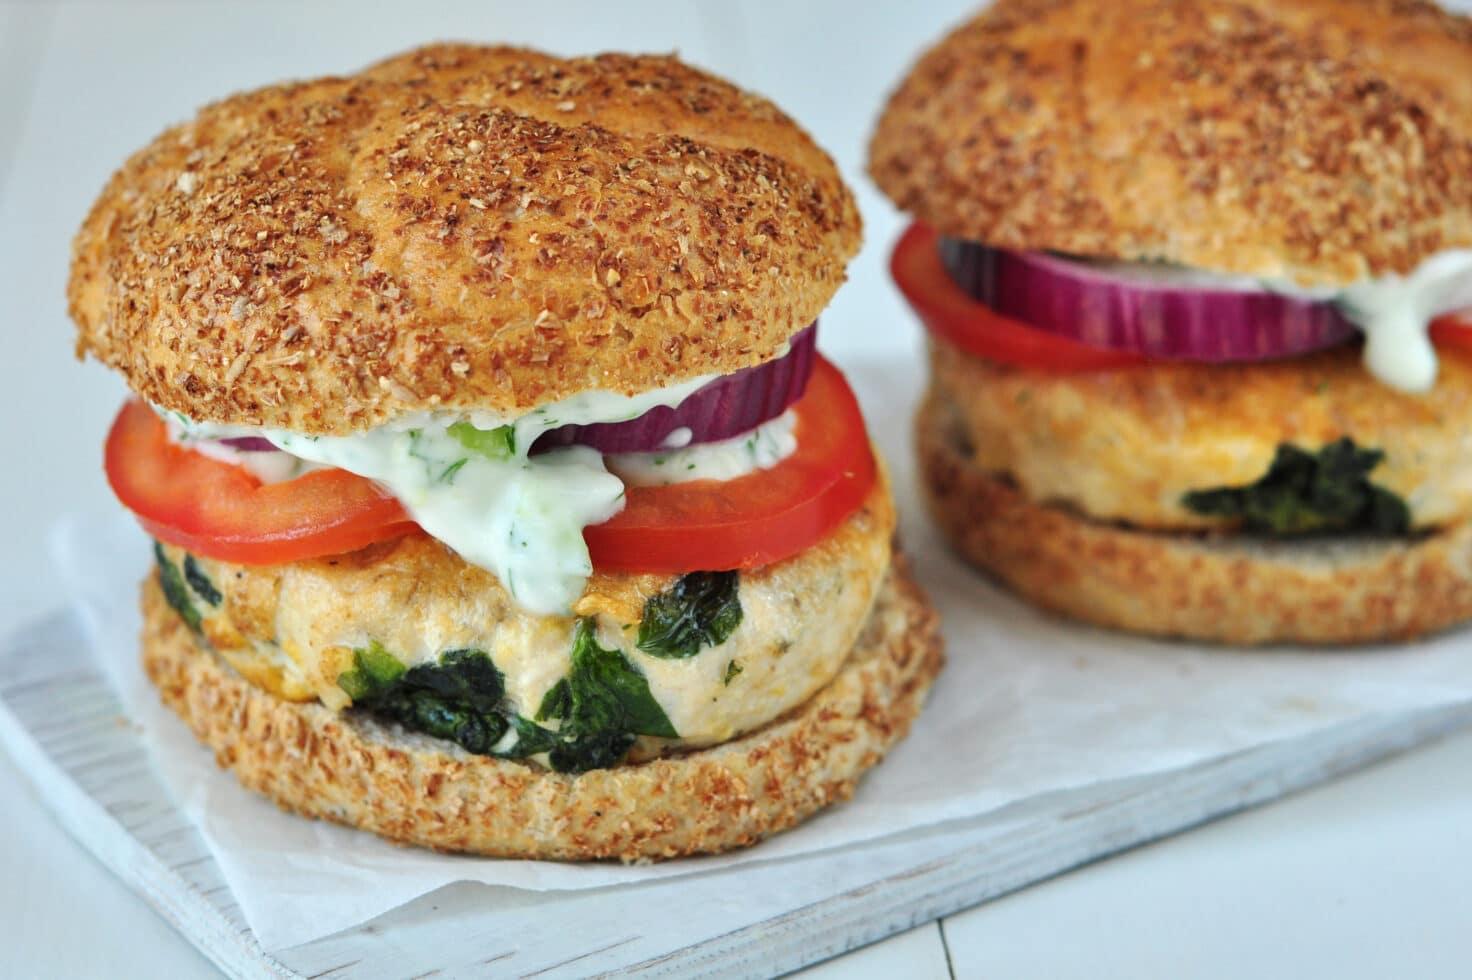 Mediterraean flavors such as spinach, feta, and tzatziki sauce make for one yummy turkey burger.